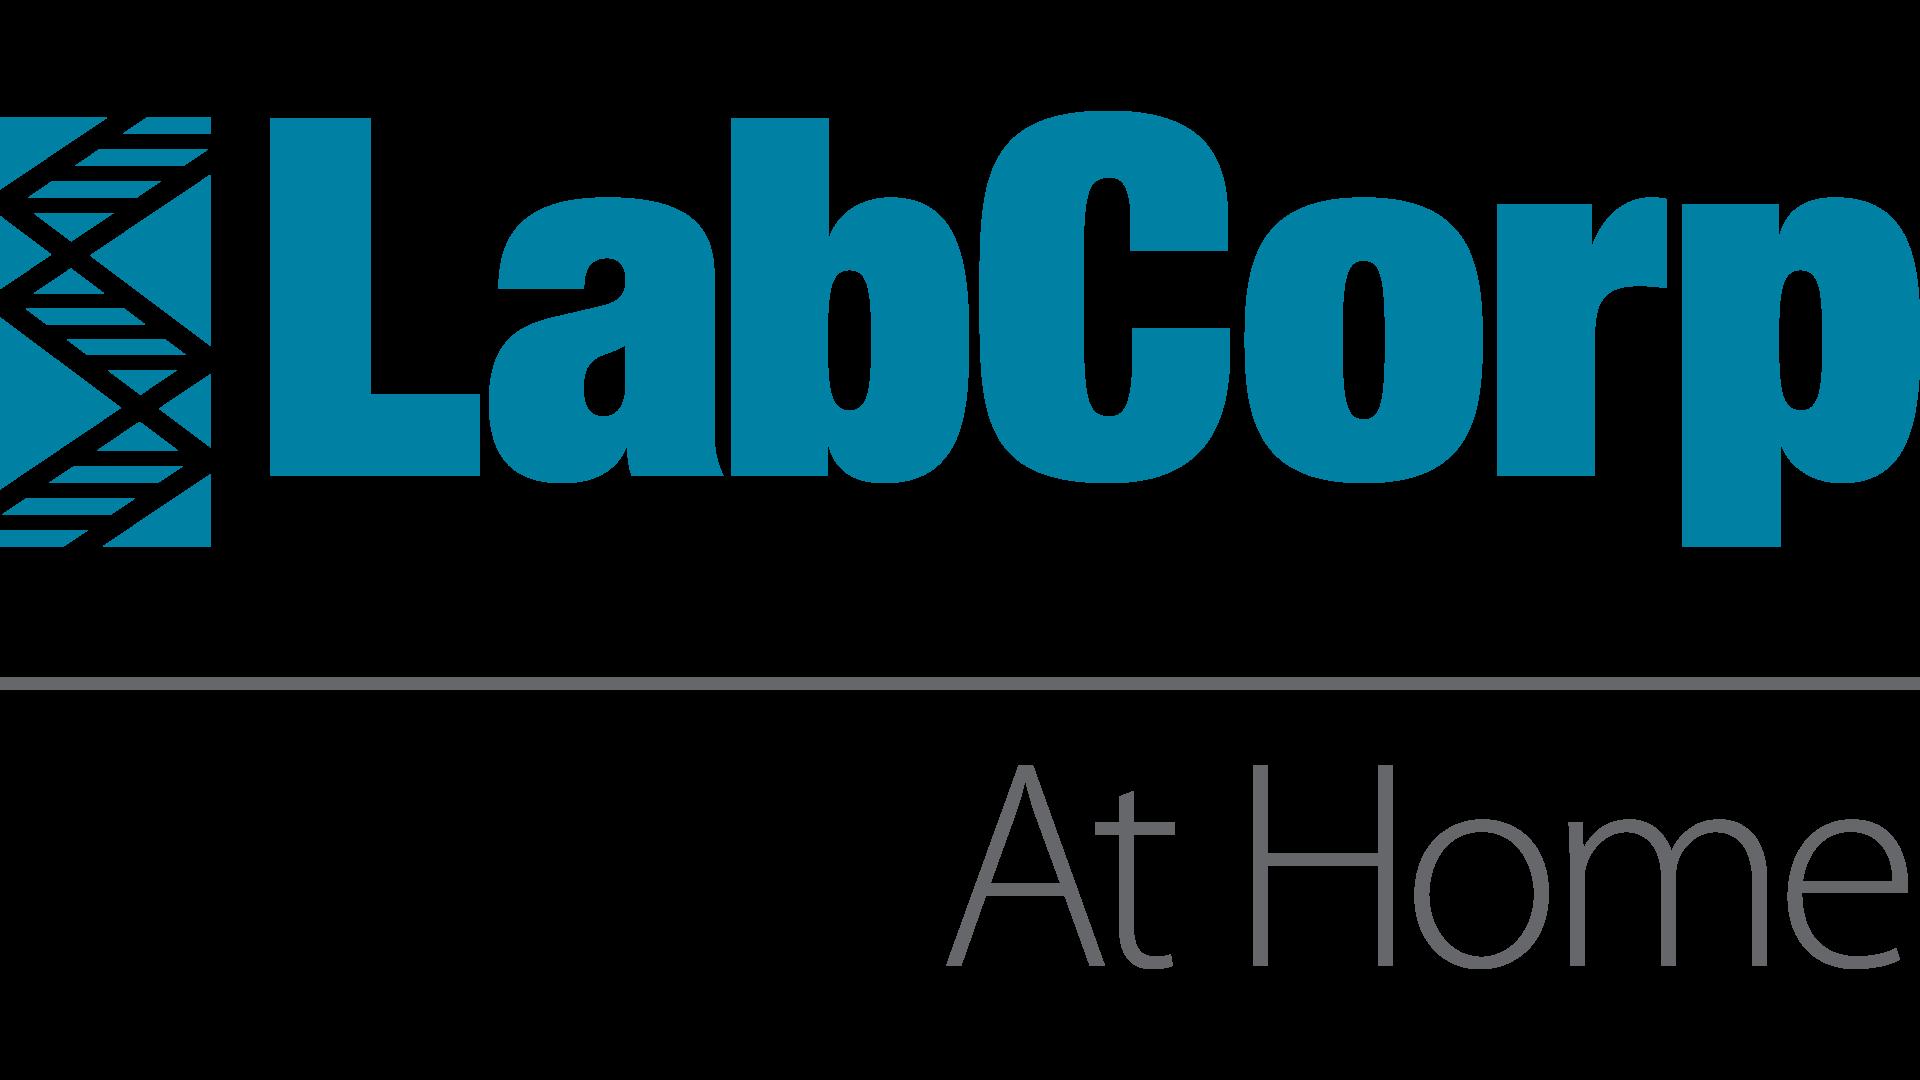 LabCorp At Home